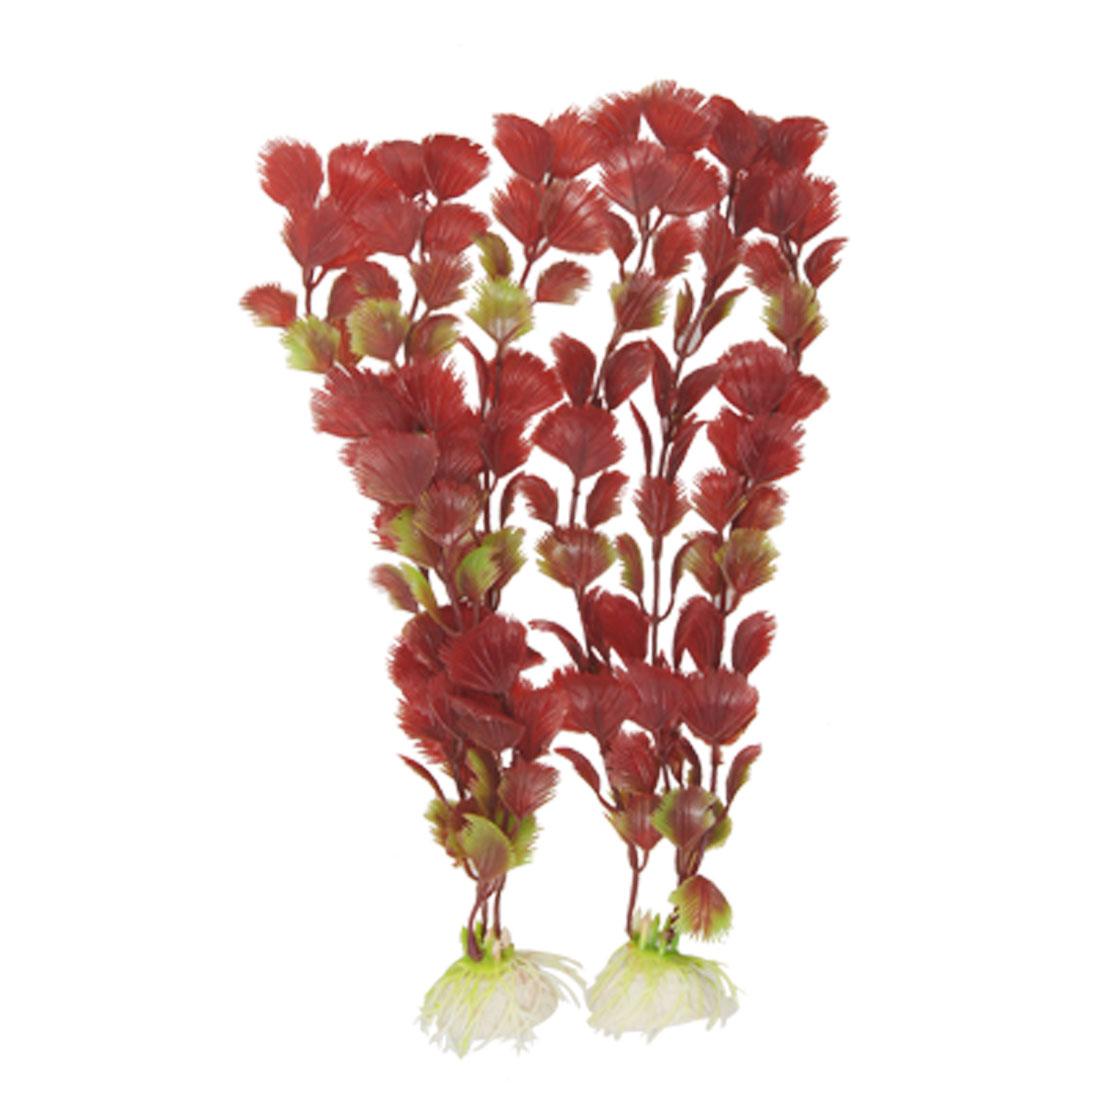 Fish Tank Burgundy Green Plastic Grass Ornament Decor 2PCS